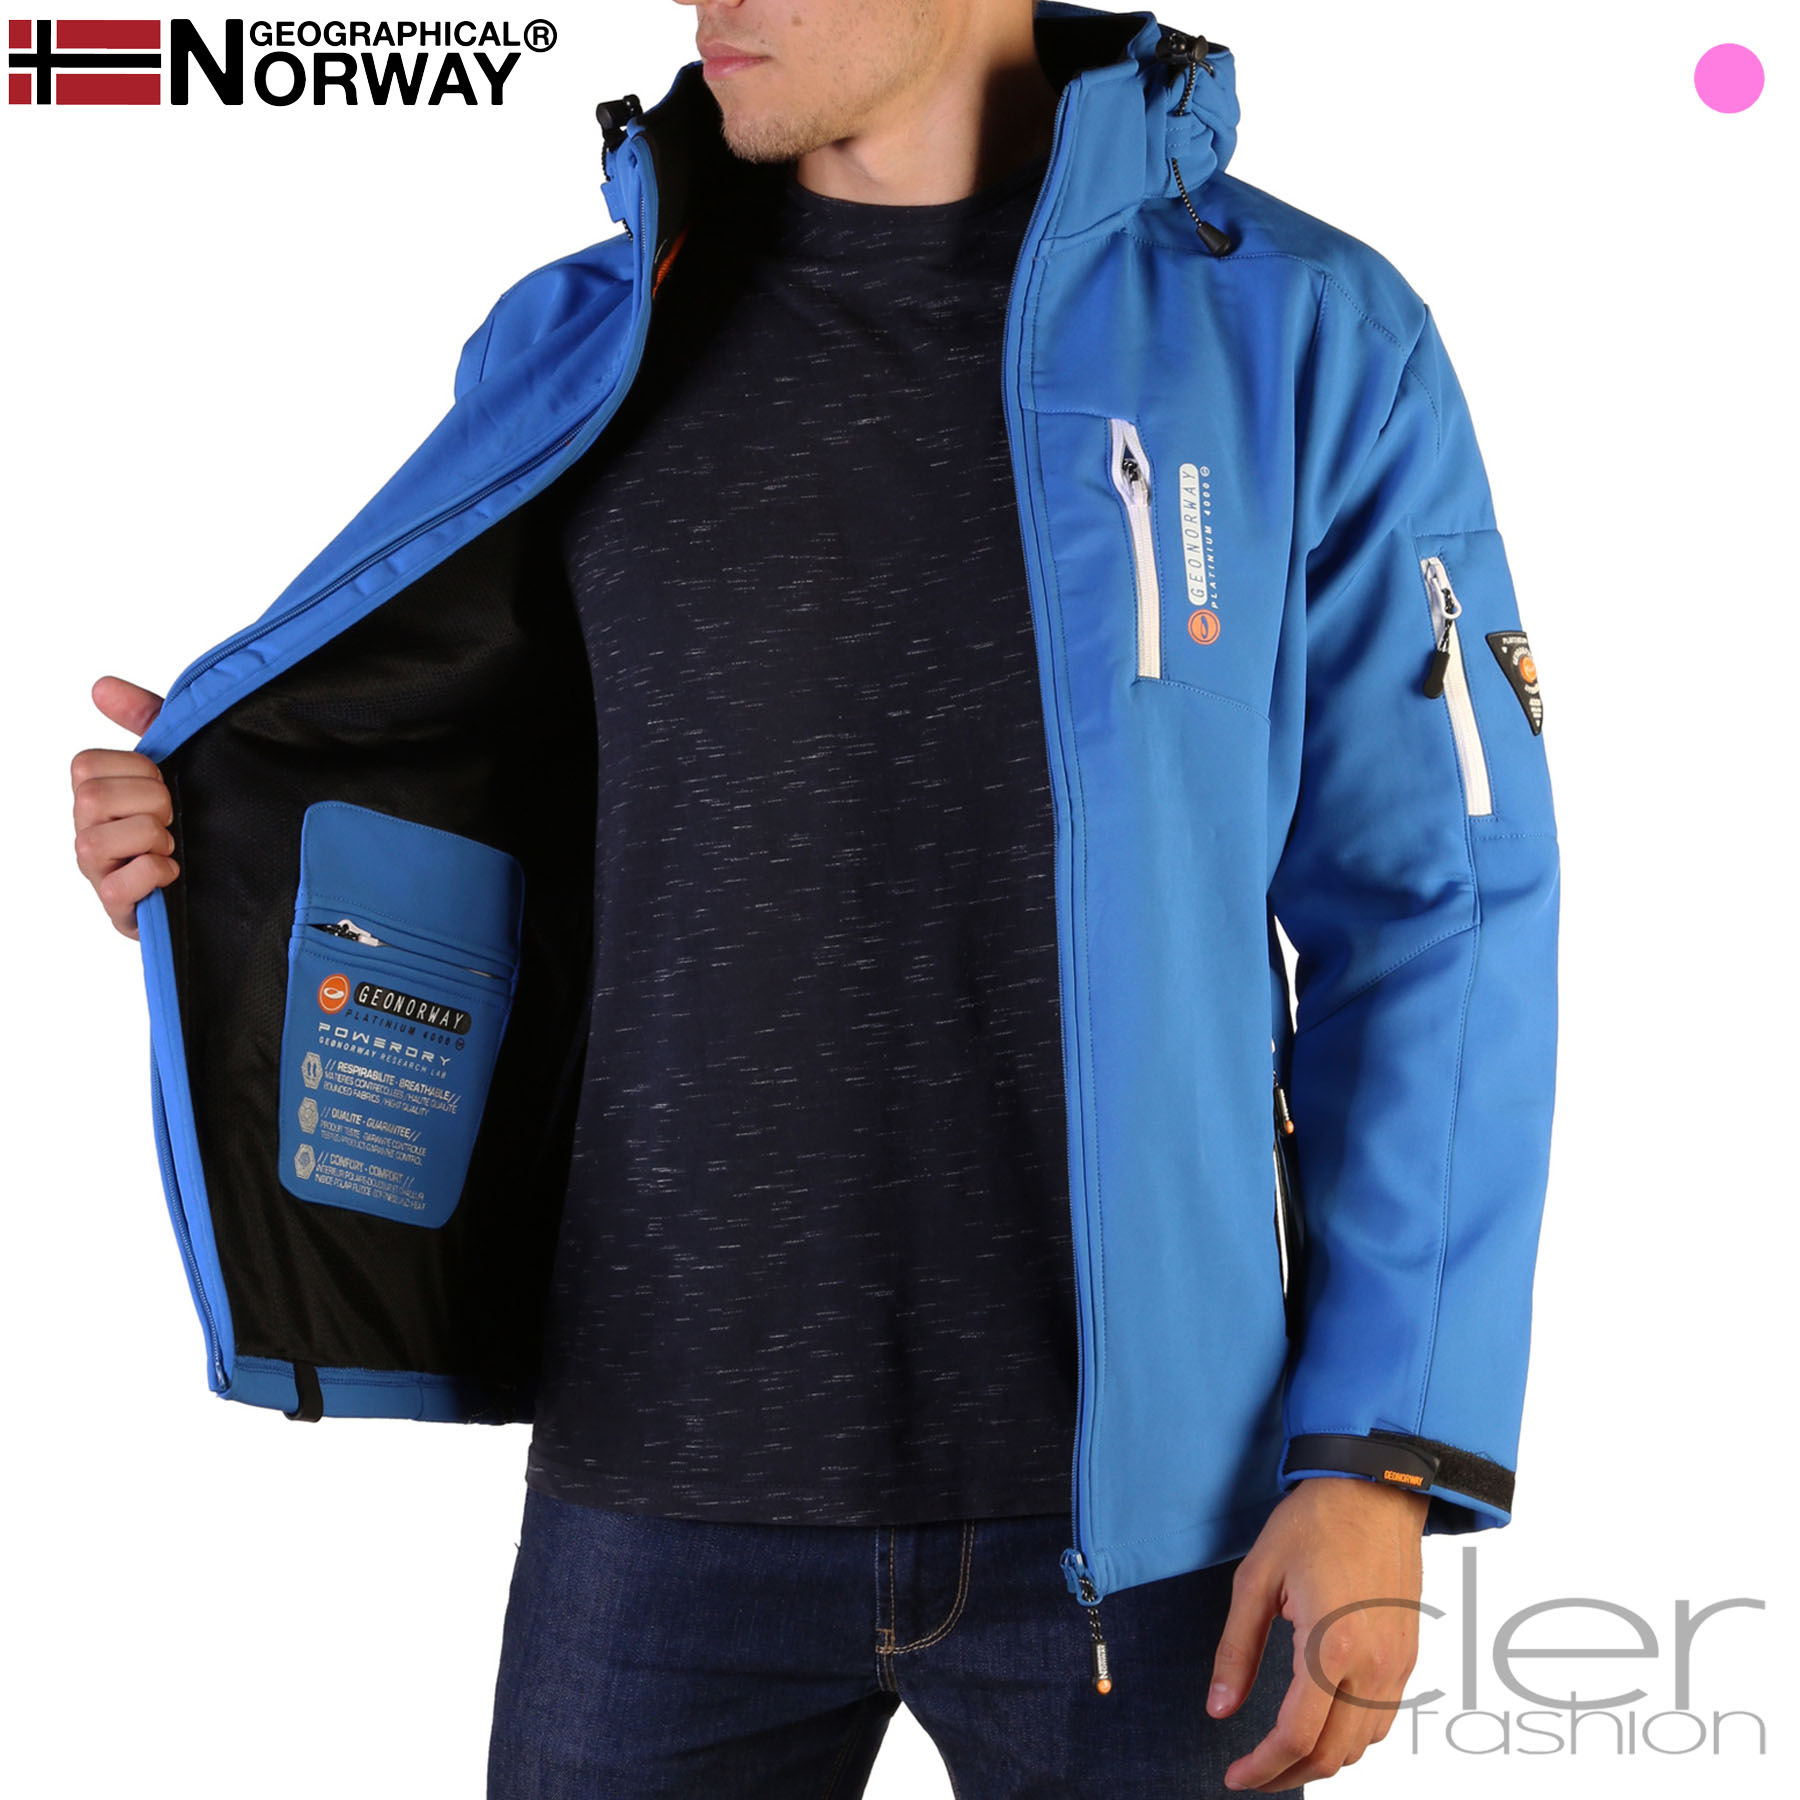 Vestes Geographical Norway Tichri_man Homme Bleu 102552